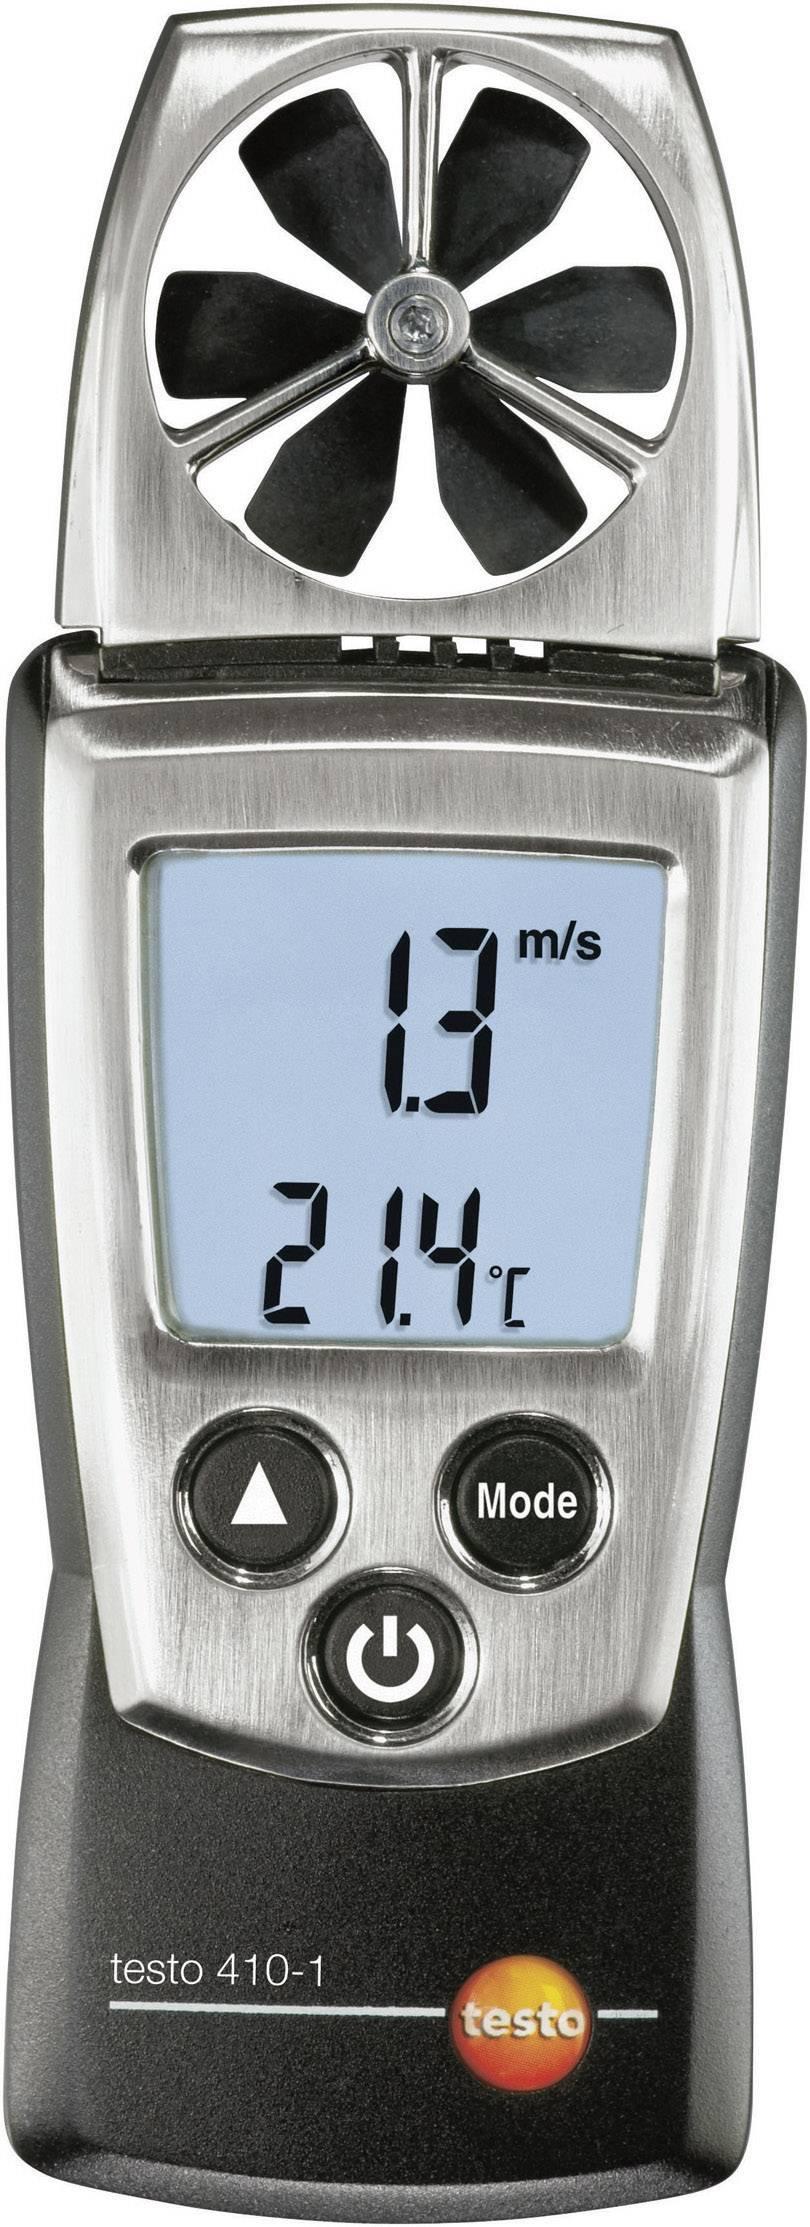 Anemometr testo 410-1, 0,4 - 20 m/s